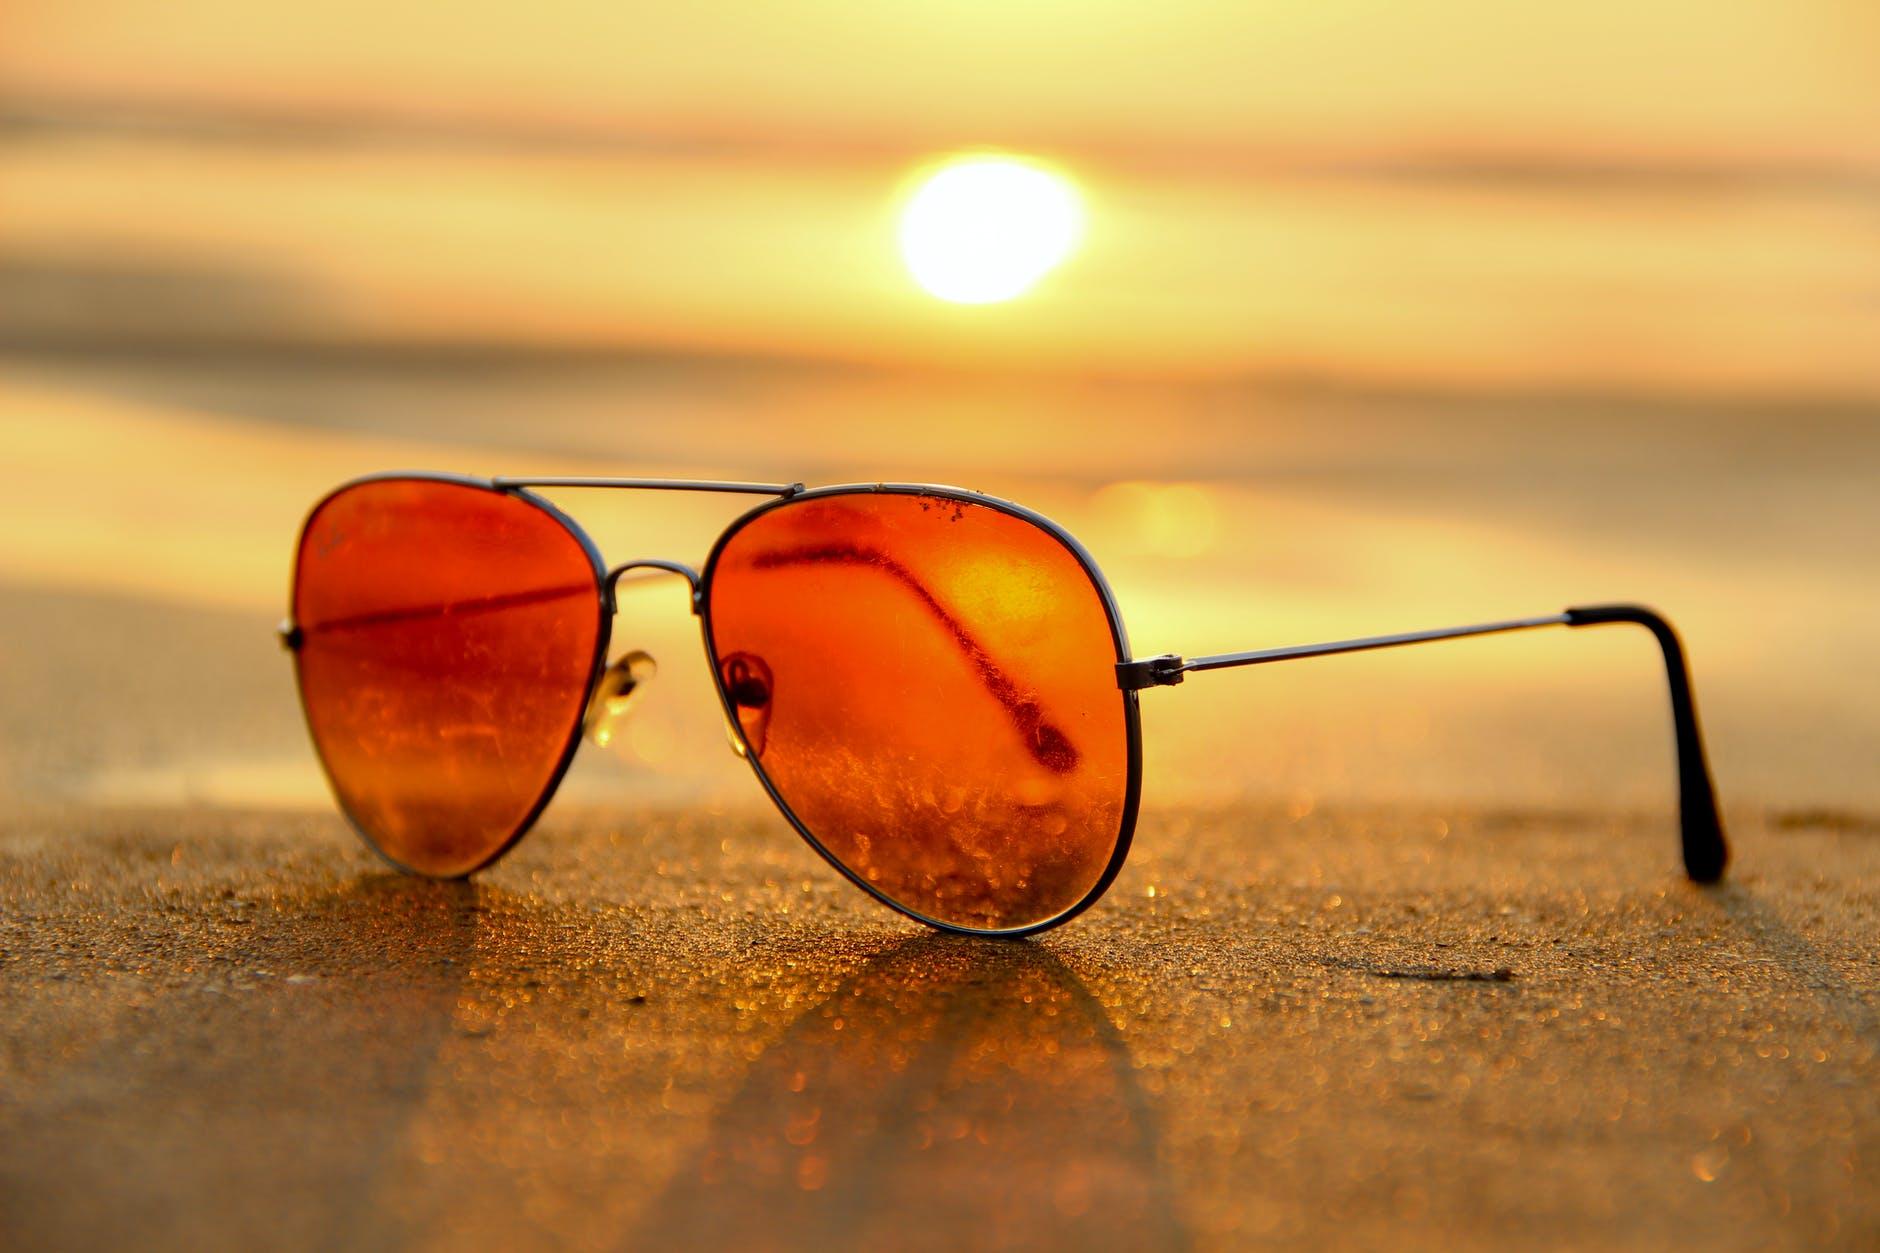 SunGlasses - Photo by Nitin Dhumal